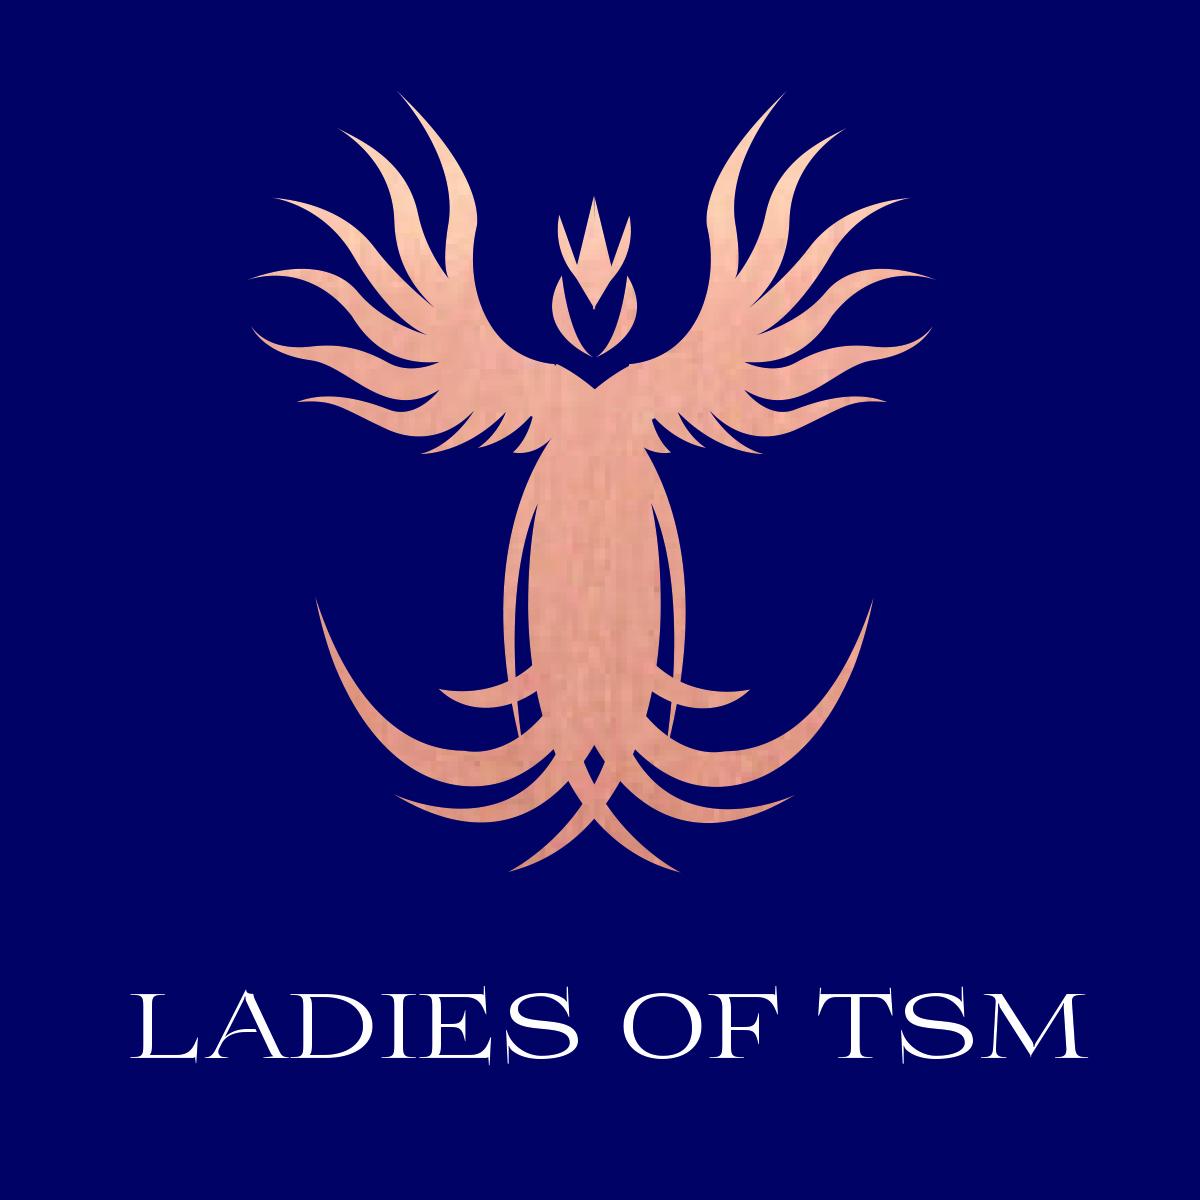 ladies-of-tsm-square.jpg